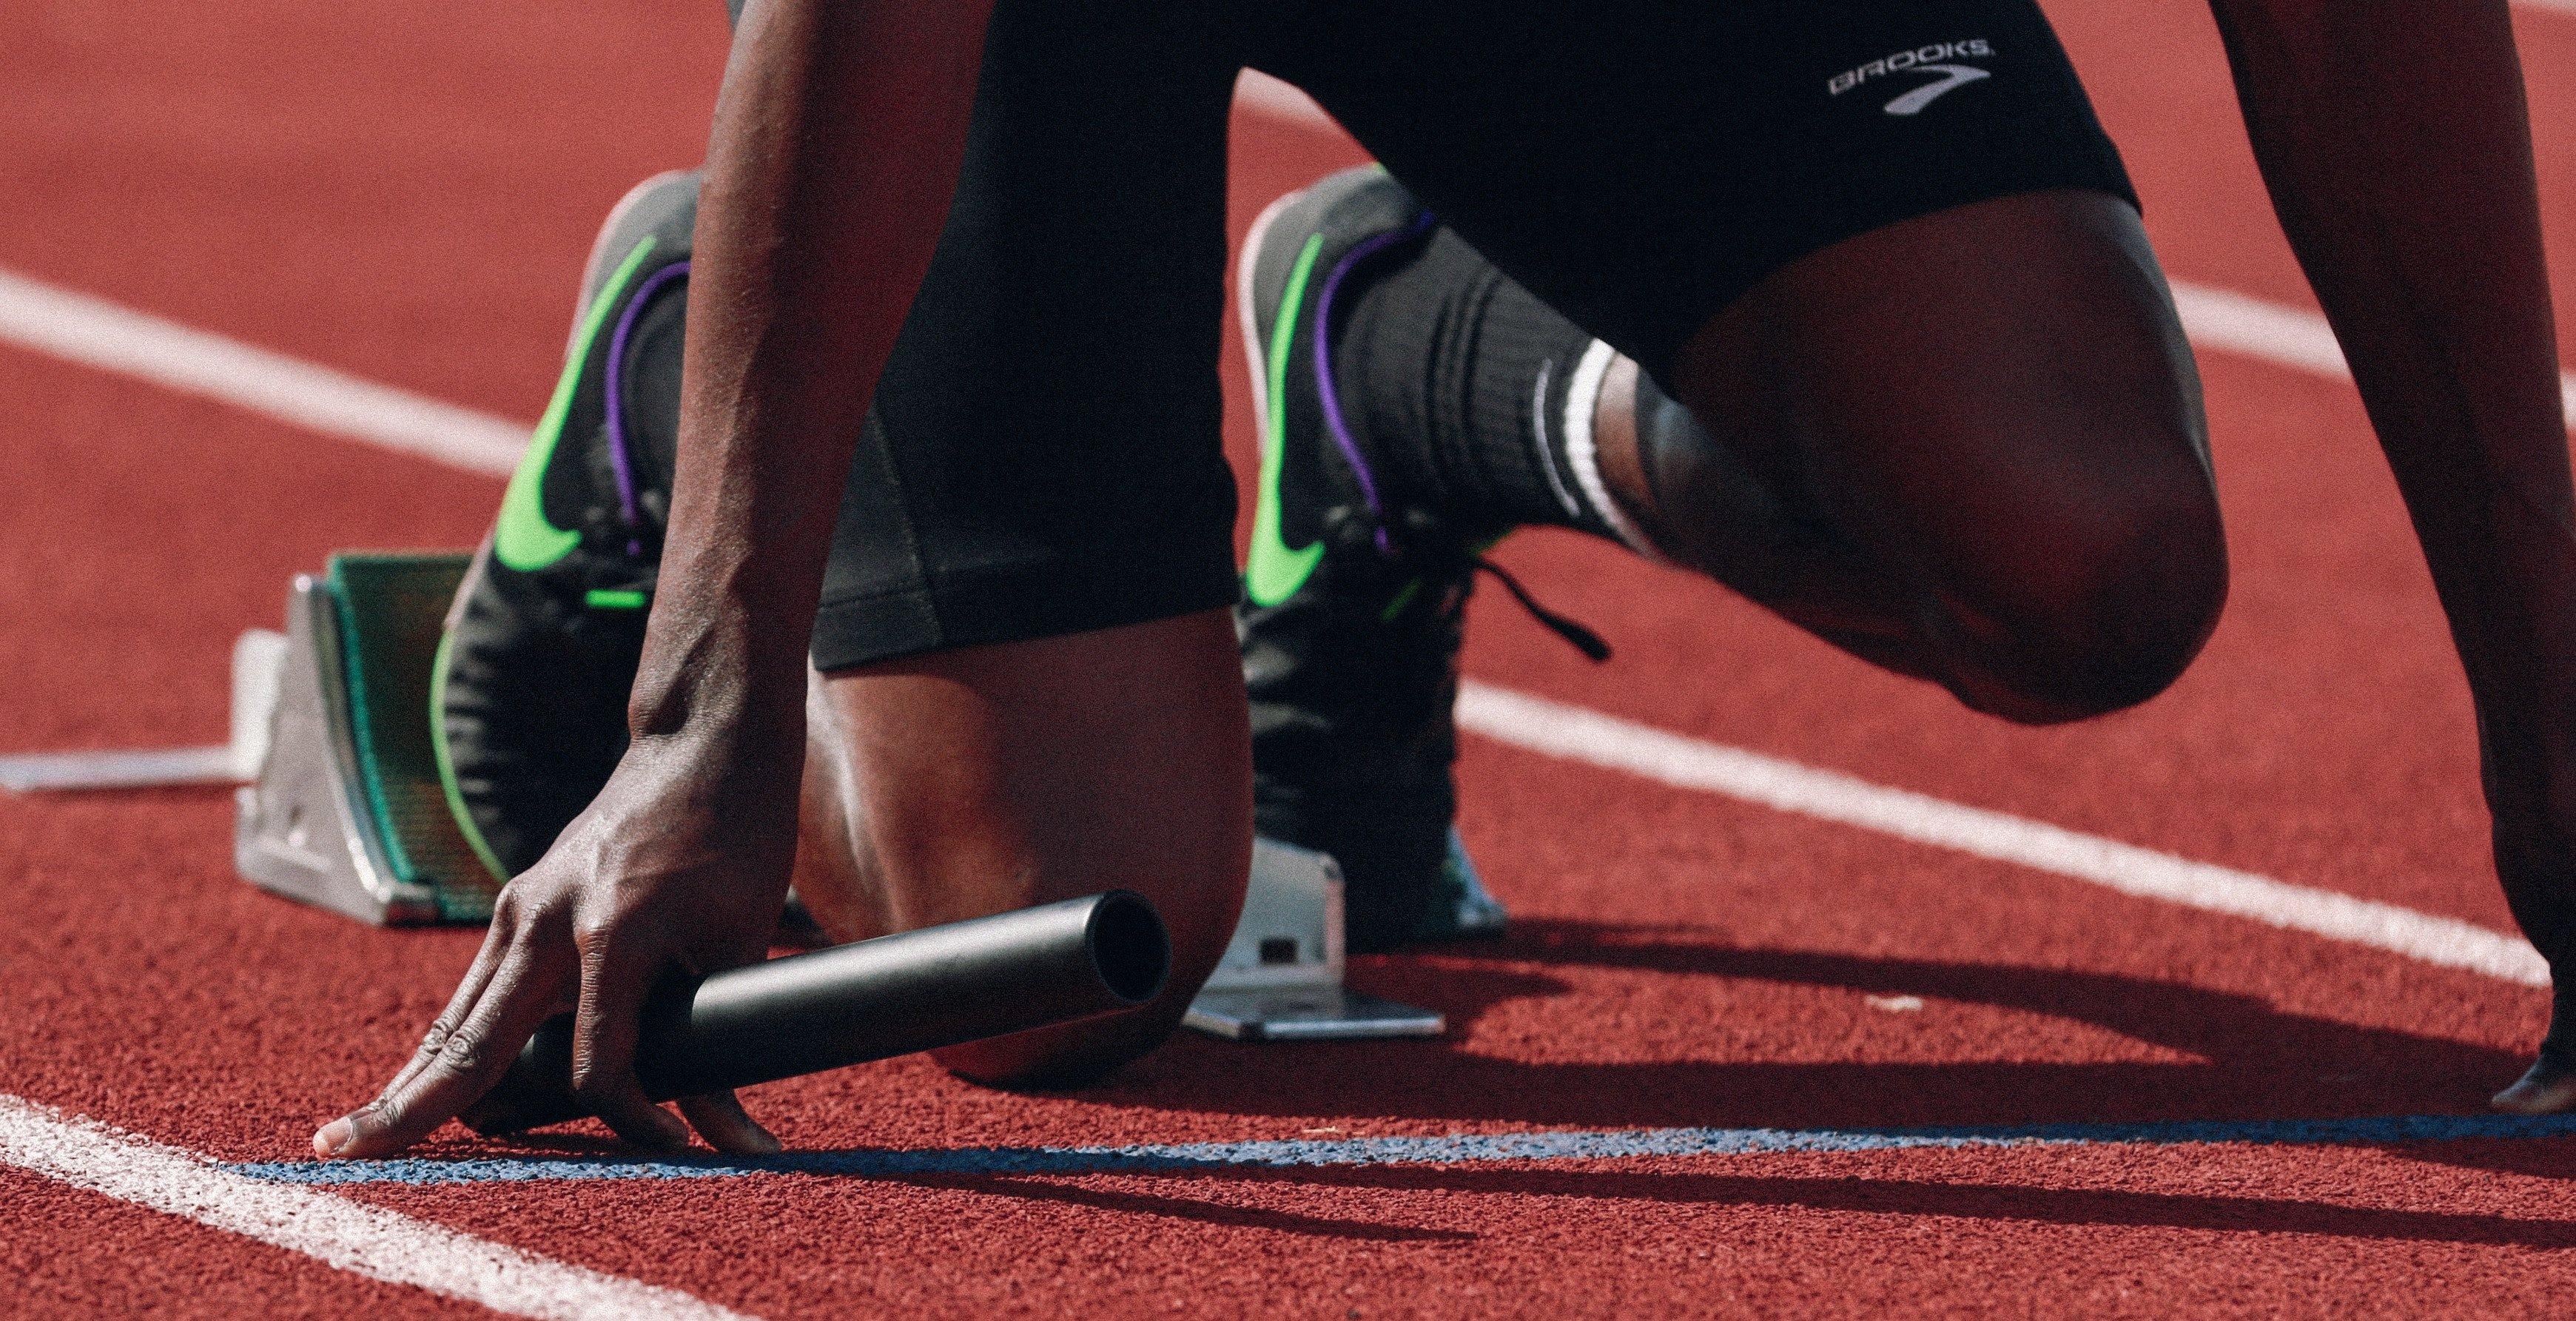 race-starting-block